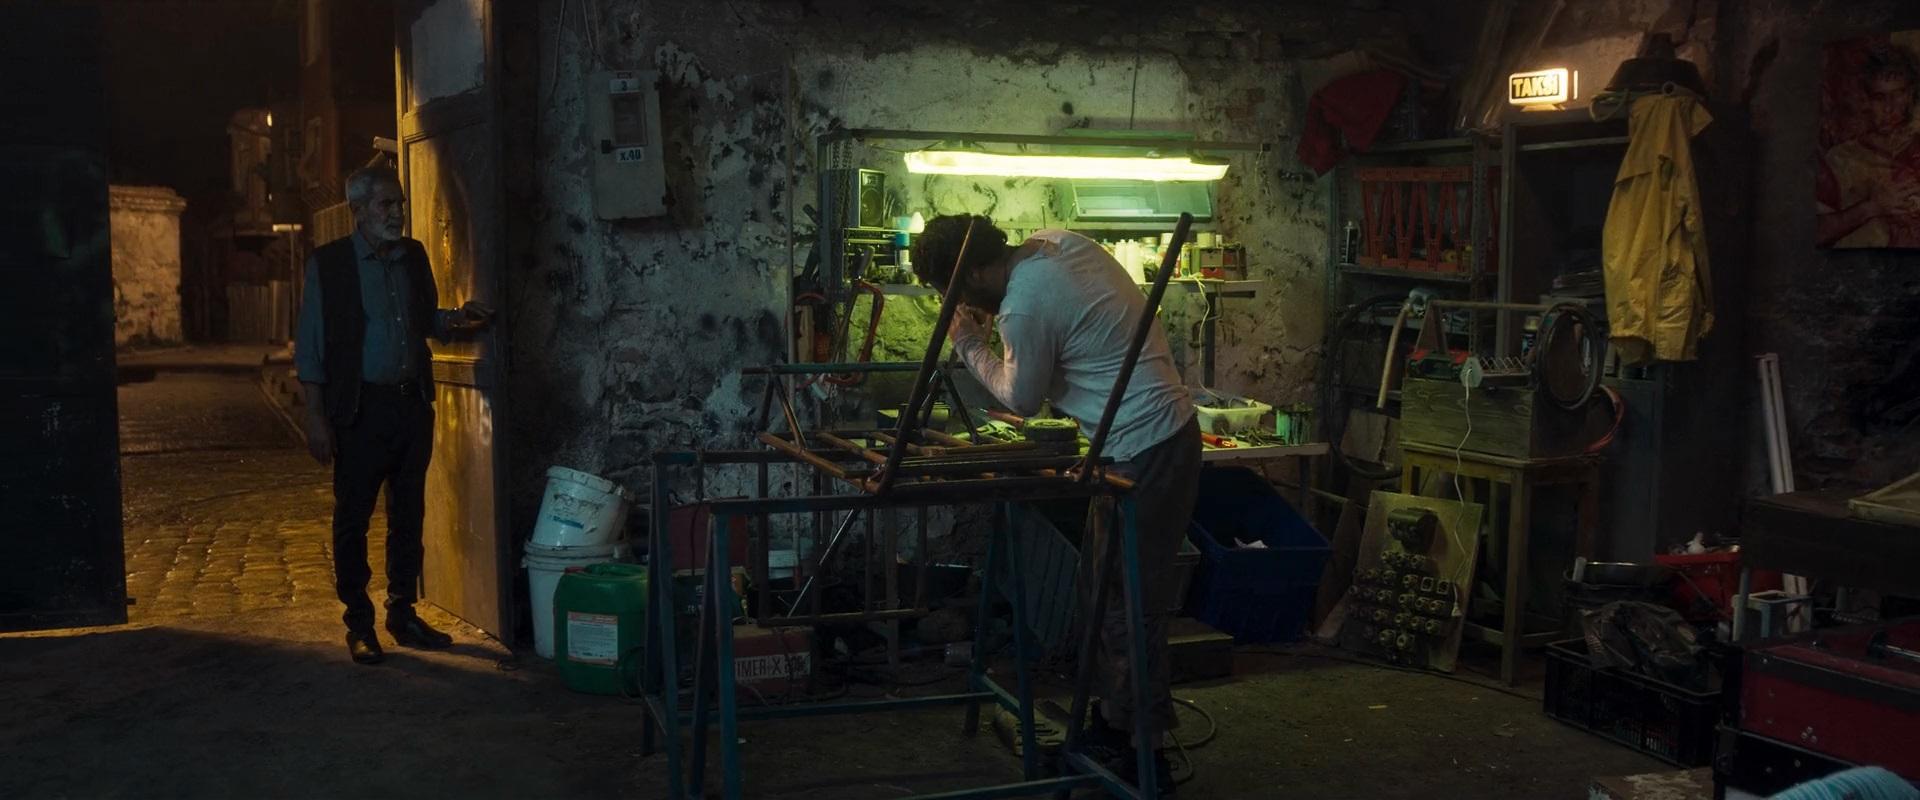 Kağıttan Hayatlar | 2021 | Yerli Film | NF | WEB-DL | XviD | Sansürsüz | 720p - 1080p - m720p - m1080p | WEB-DL | Tek Link